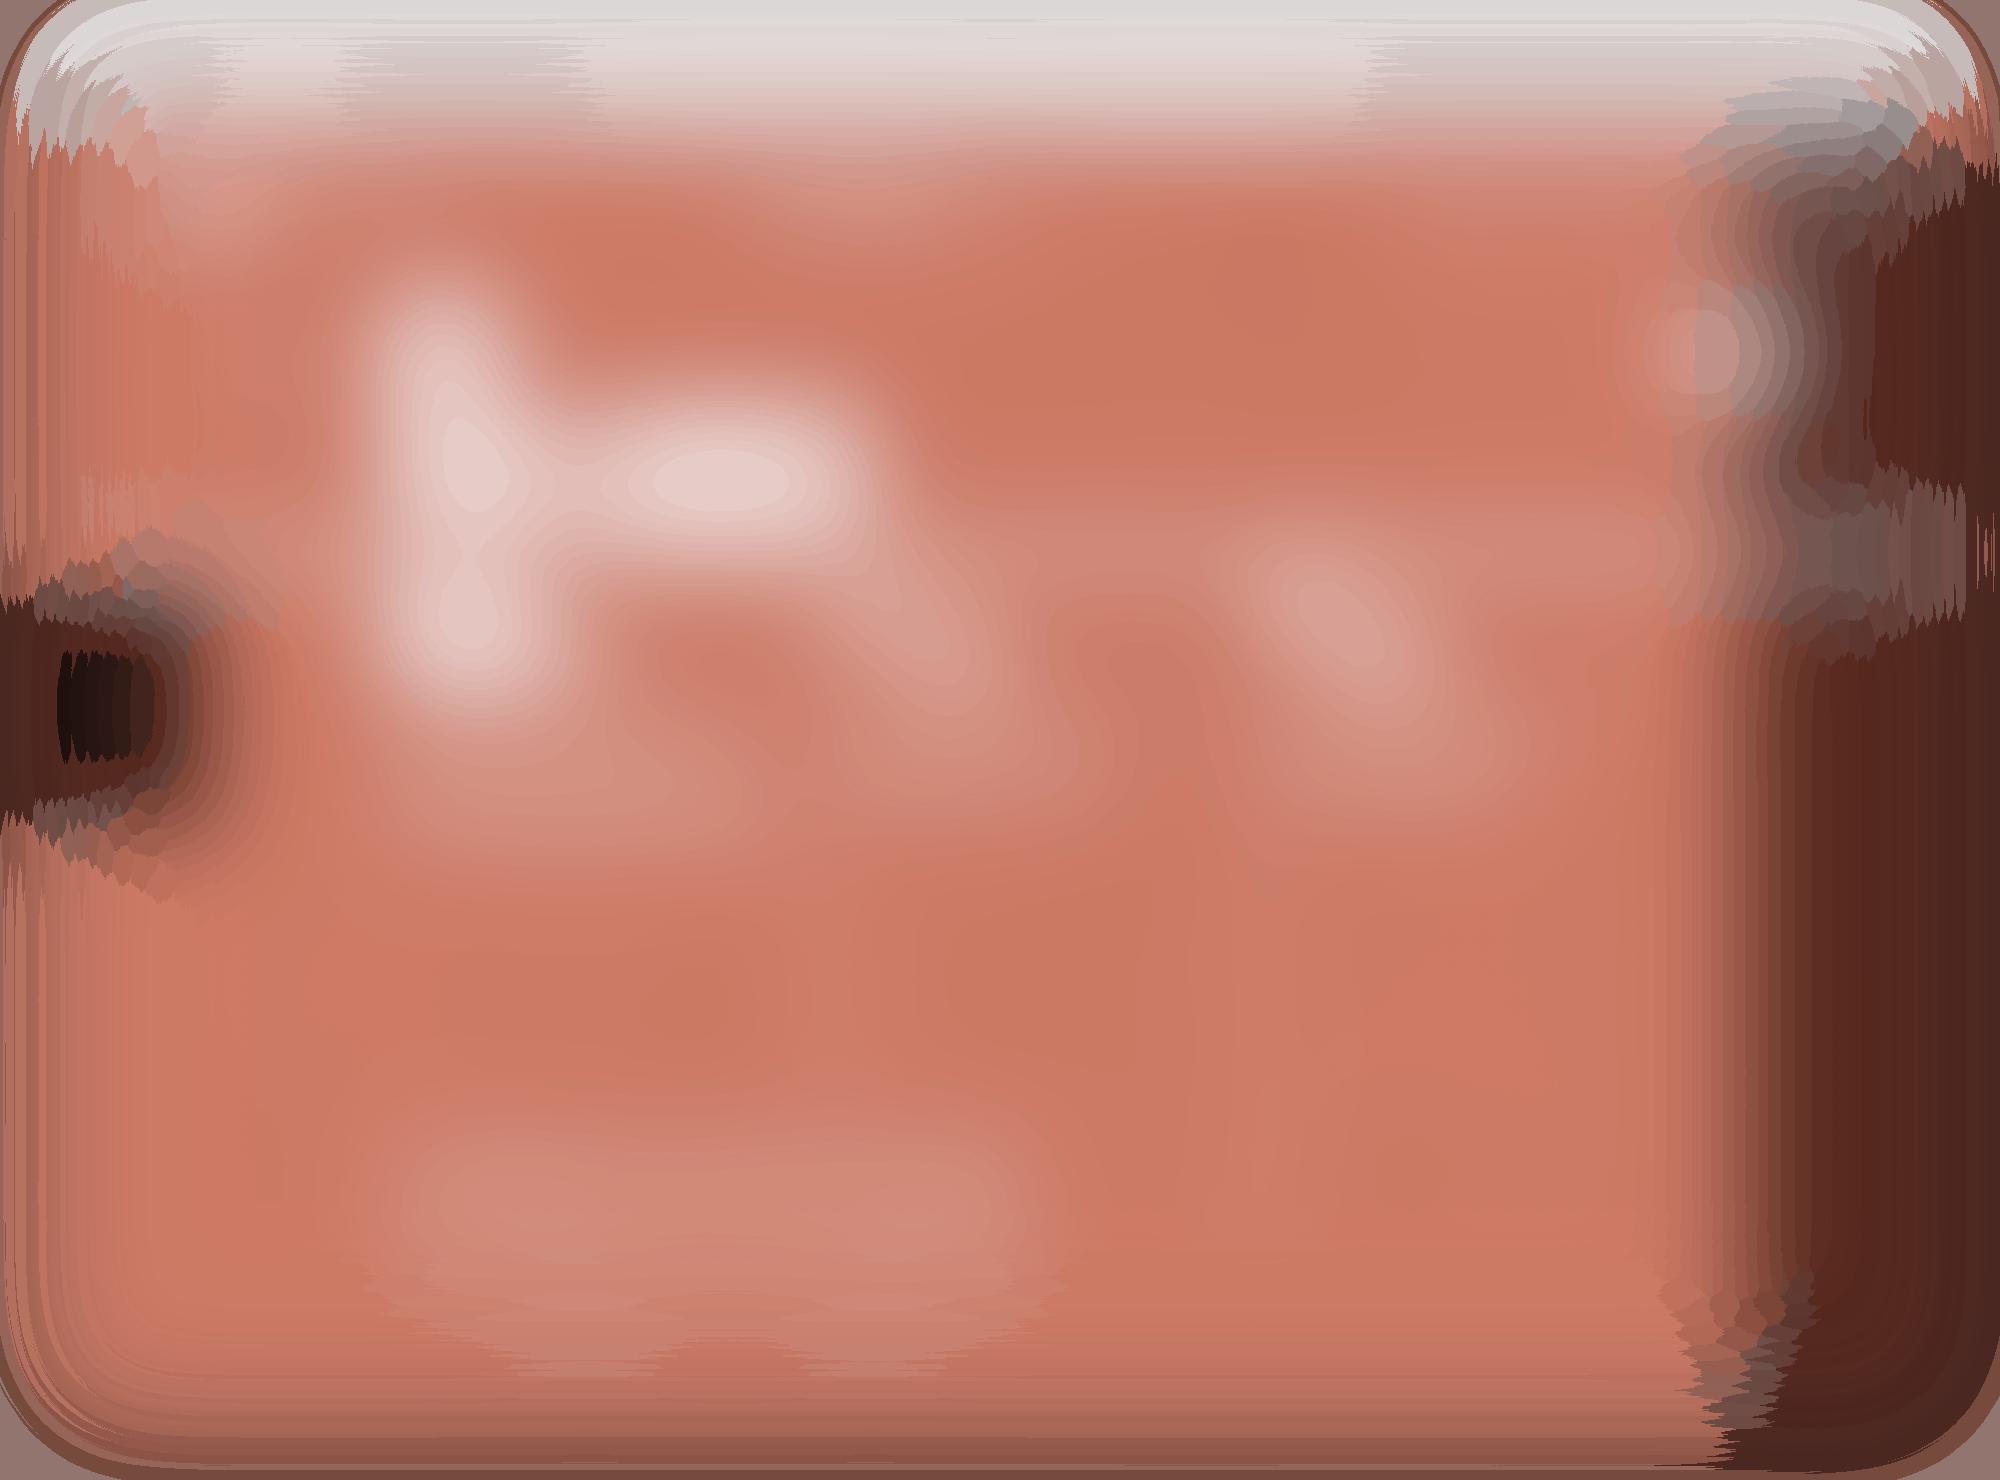 Screenshot 2019 01 16 at 10 13 55 autocompressfitresizeixlibphp 1 1 0max h2000max w3 D2000q80s979bd991eb0bce3b30bfaeaa6a373dee